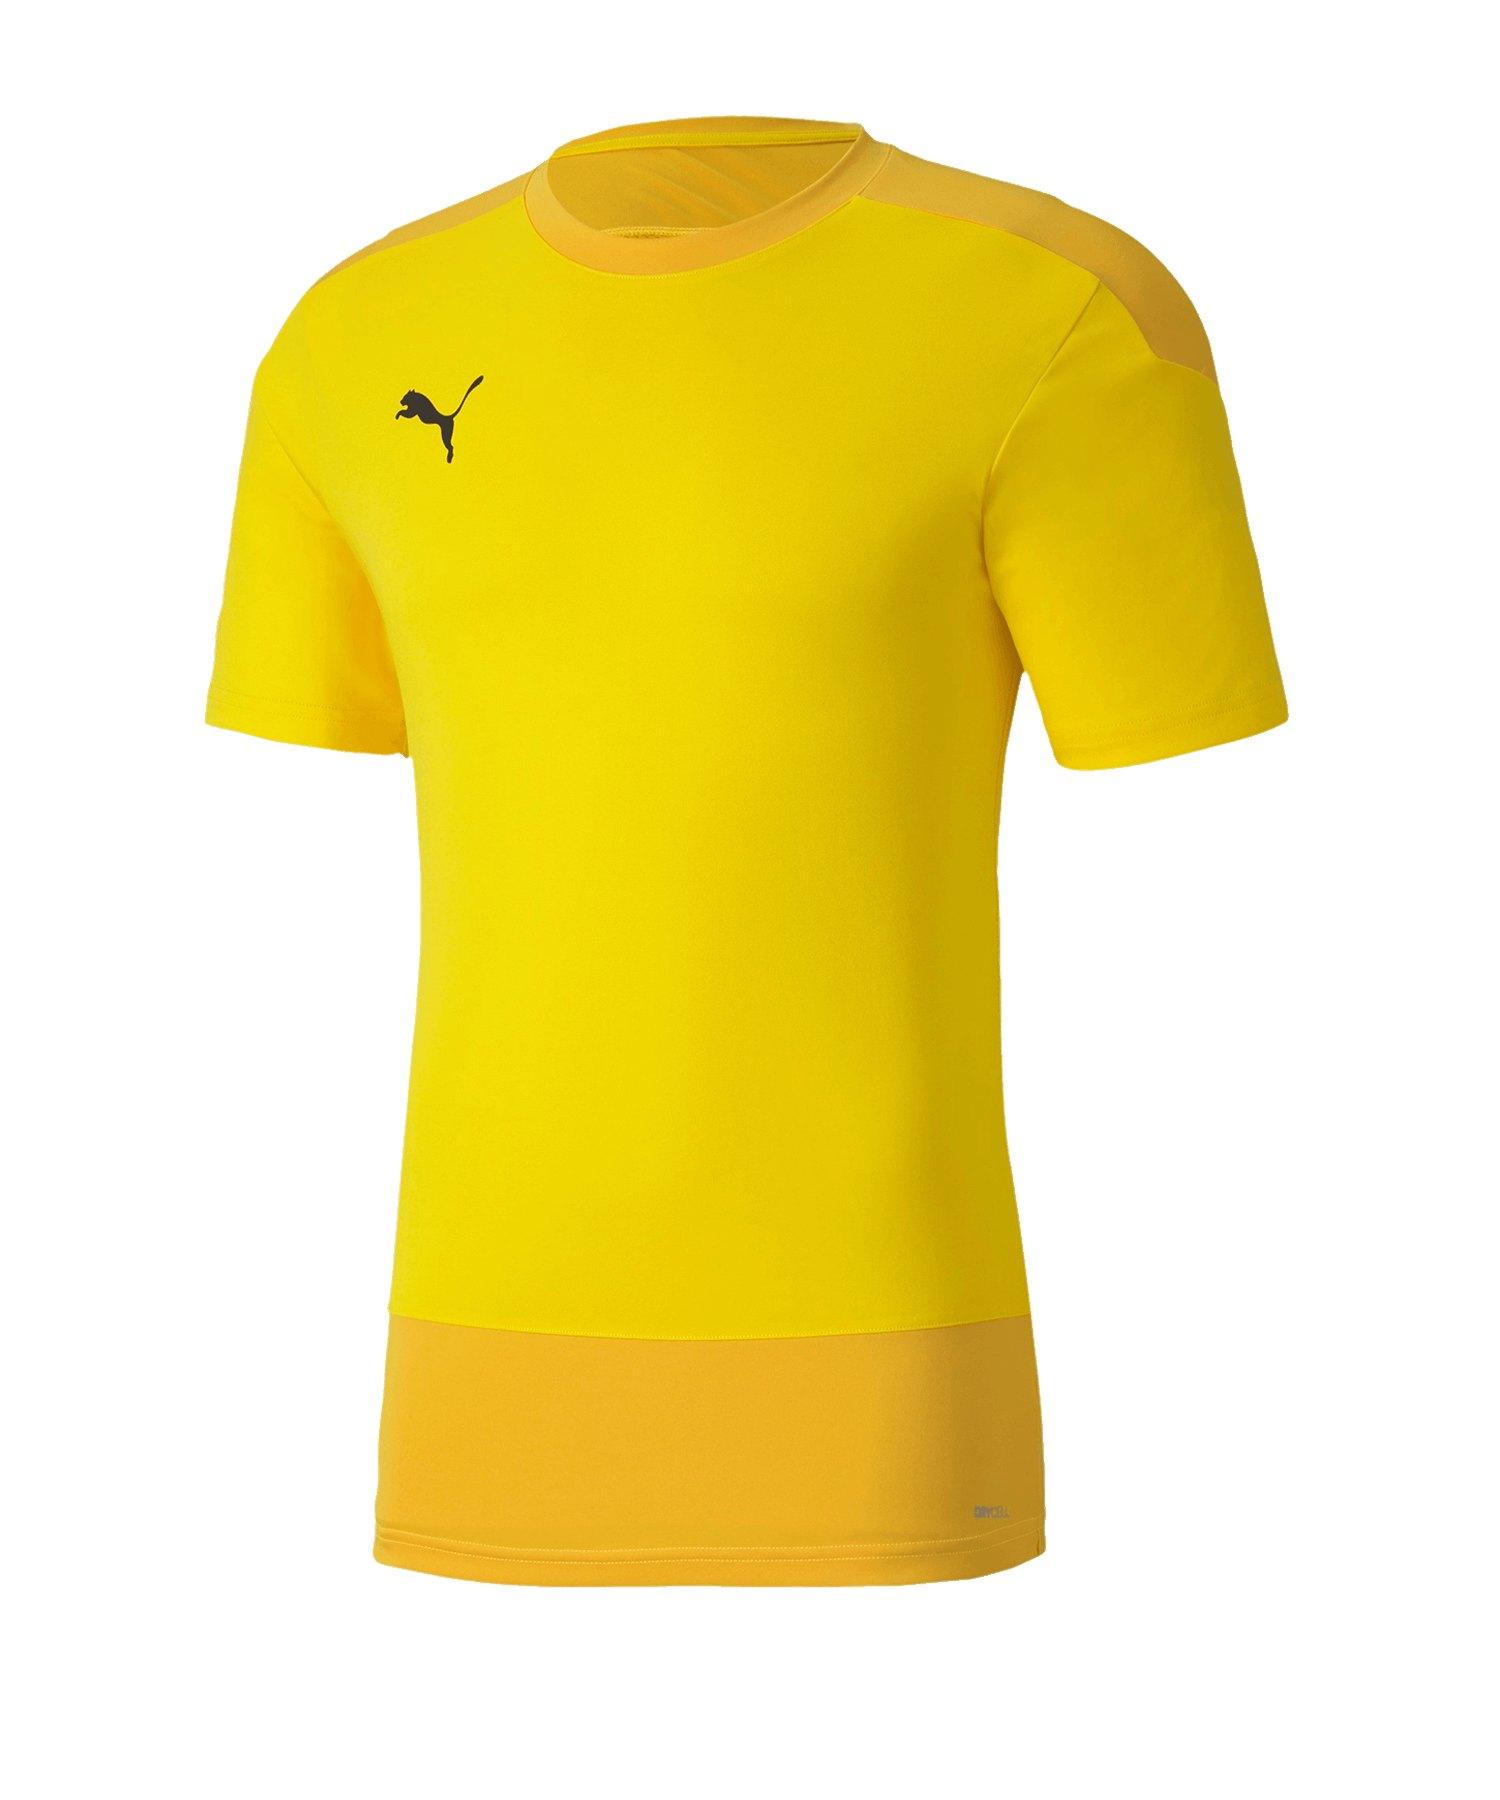 PUMA teamGOAL 23 Training Trikot Gelb F07 - gelb